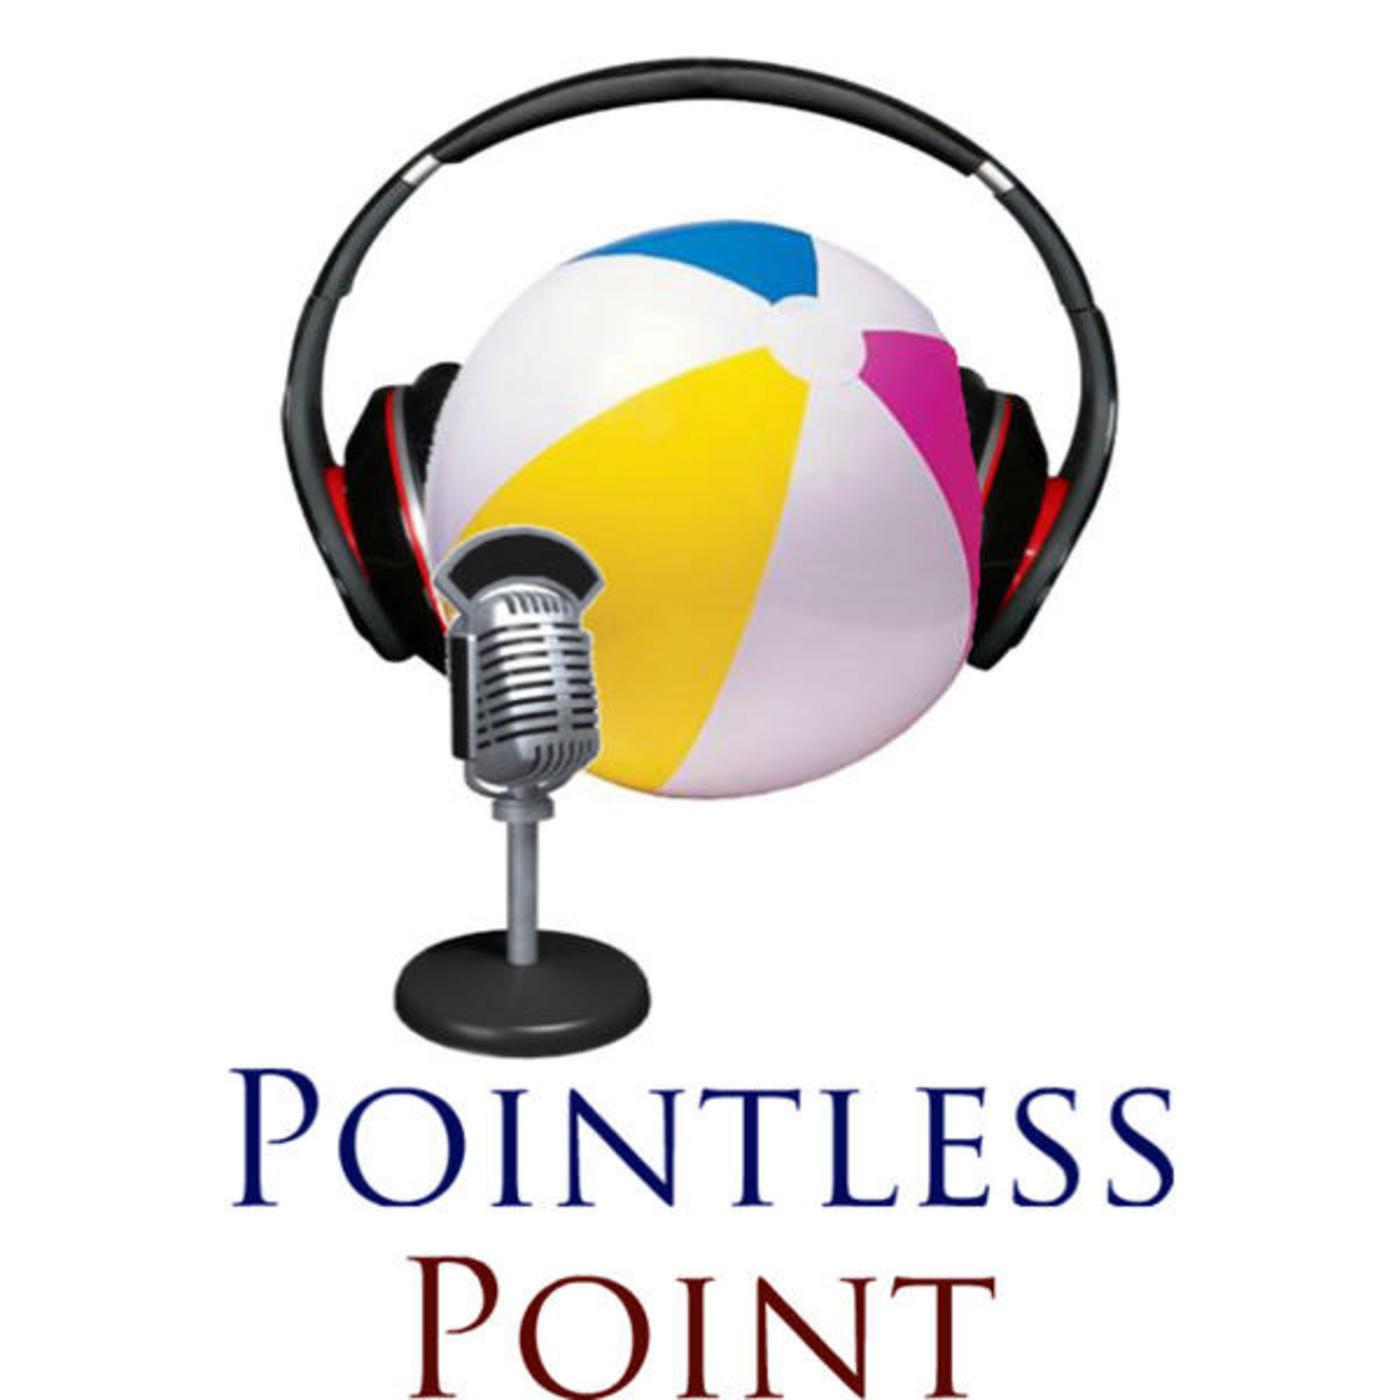 Pointless Point Podcast Season 2 Episode 15